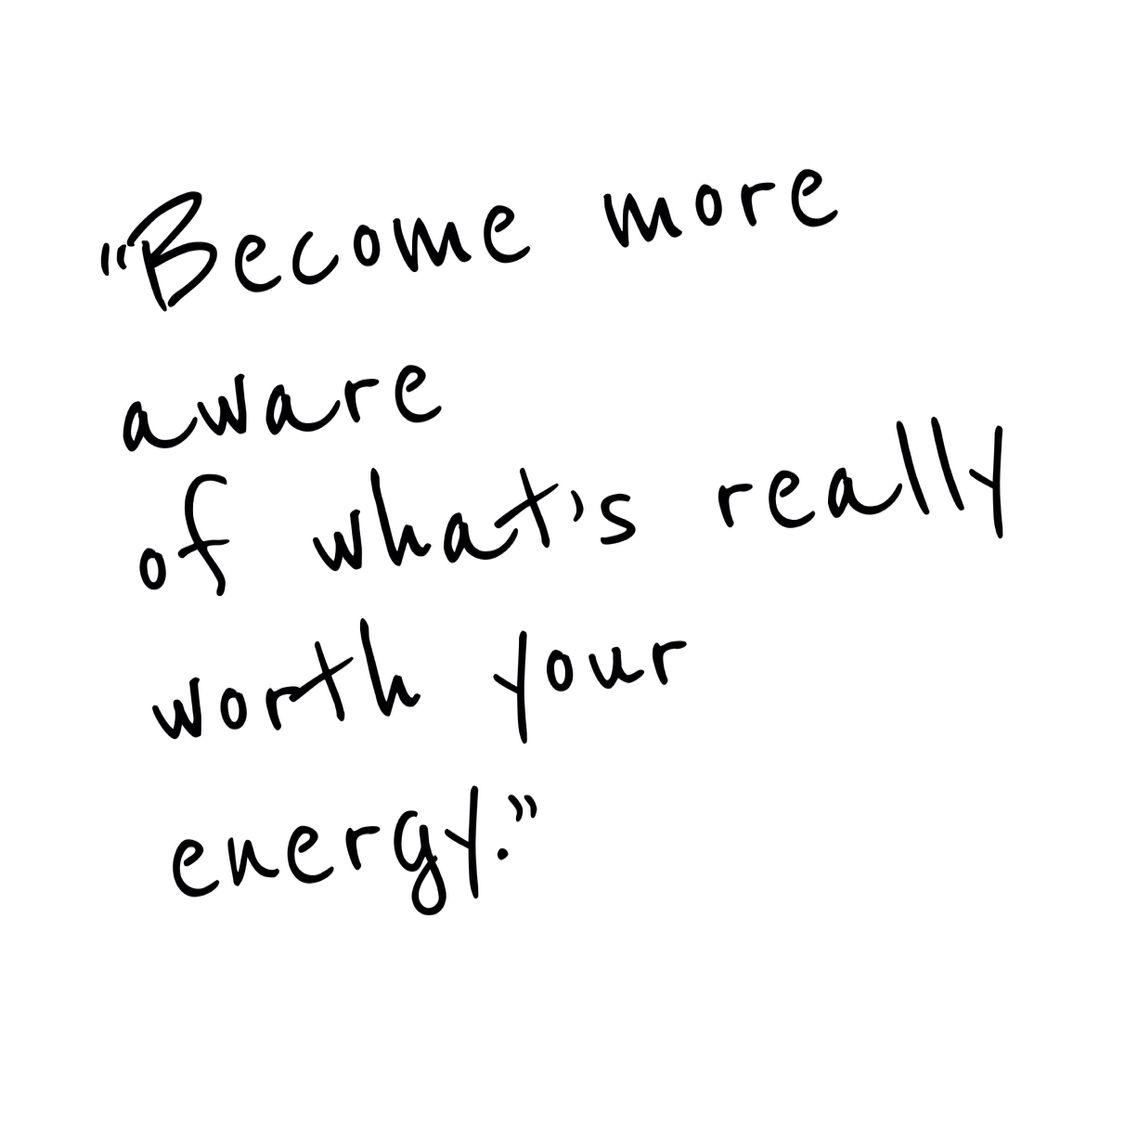 Thewisdomchapter Quotes Quote Wisdom Love Positivity Perspective Positivevibes Inspiration Motivational Energi Citat Inspirerande Citat Dagliga Citat